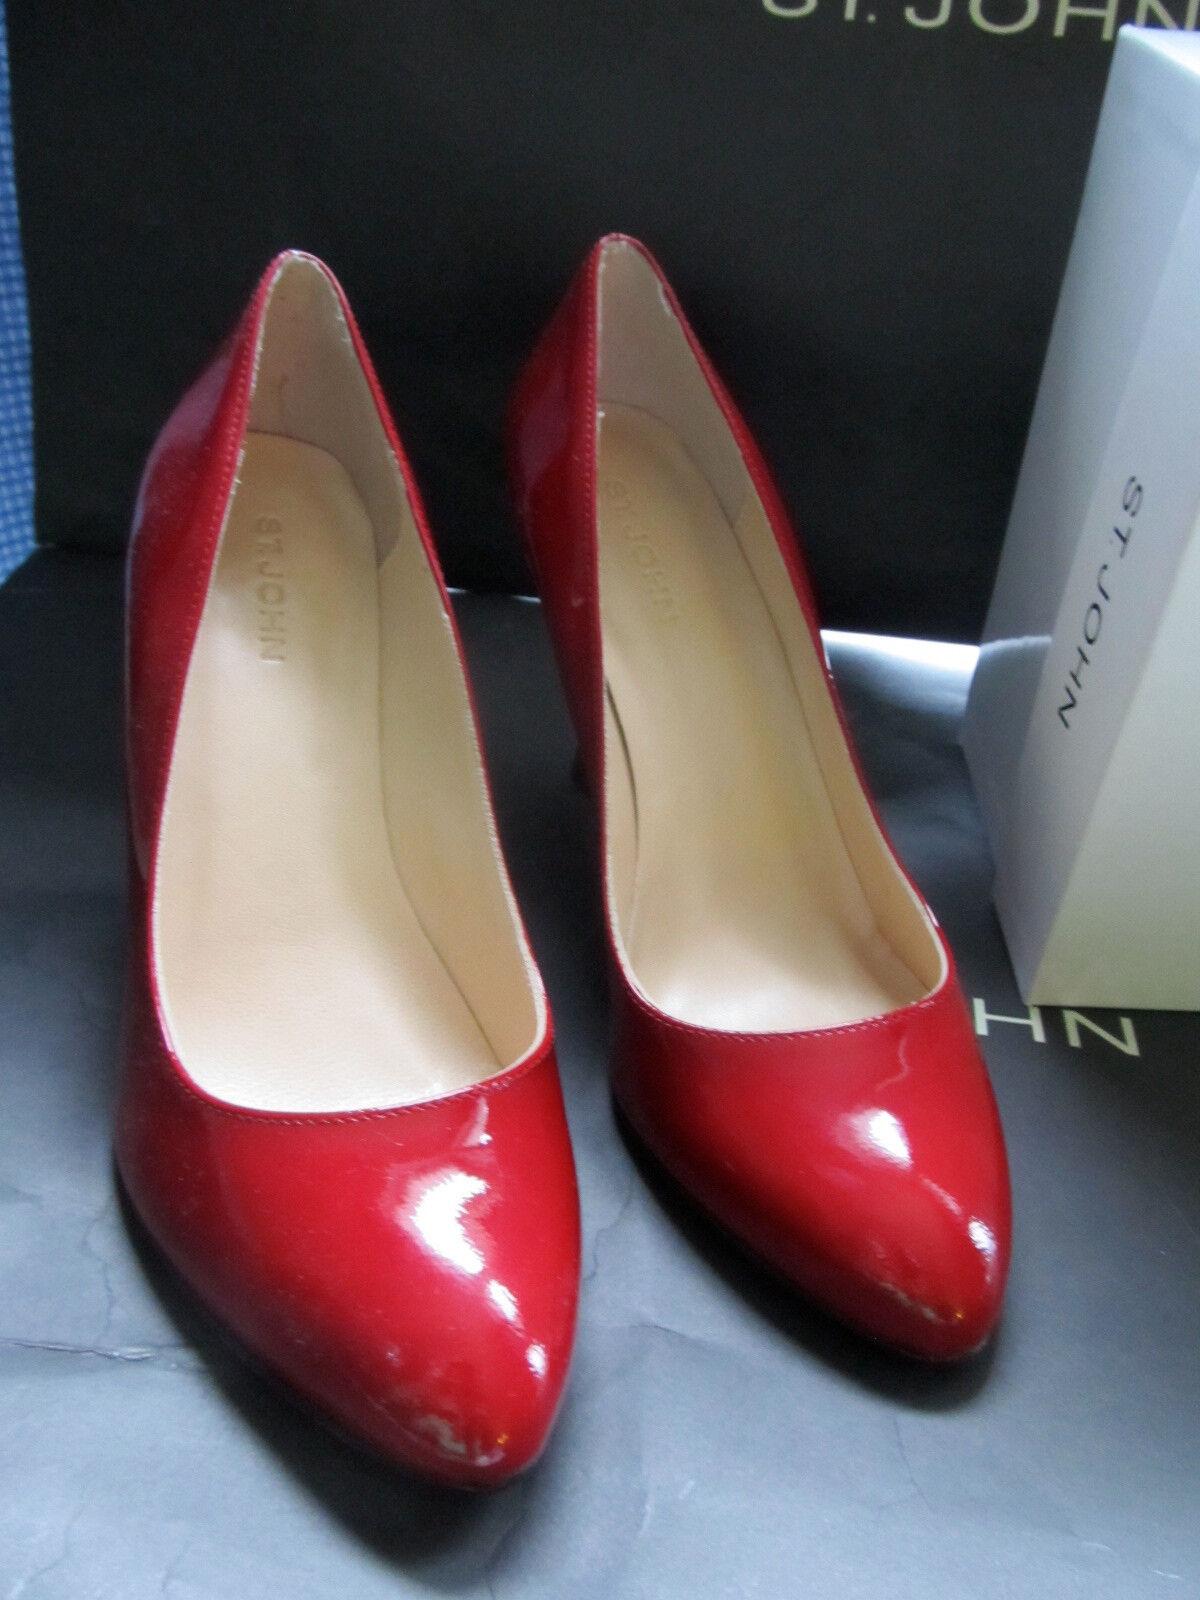 NEW ST JOHN KNIT SIZE 6 M PATENT Damenschuhe Schuhe ROT PATENT M LEATHER HEELS 3.5